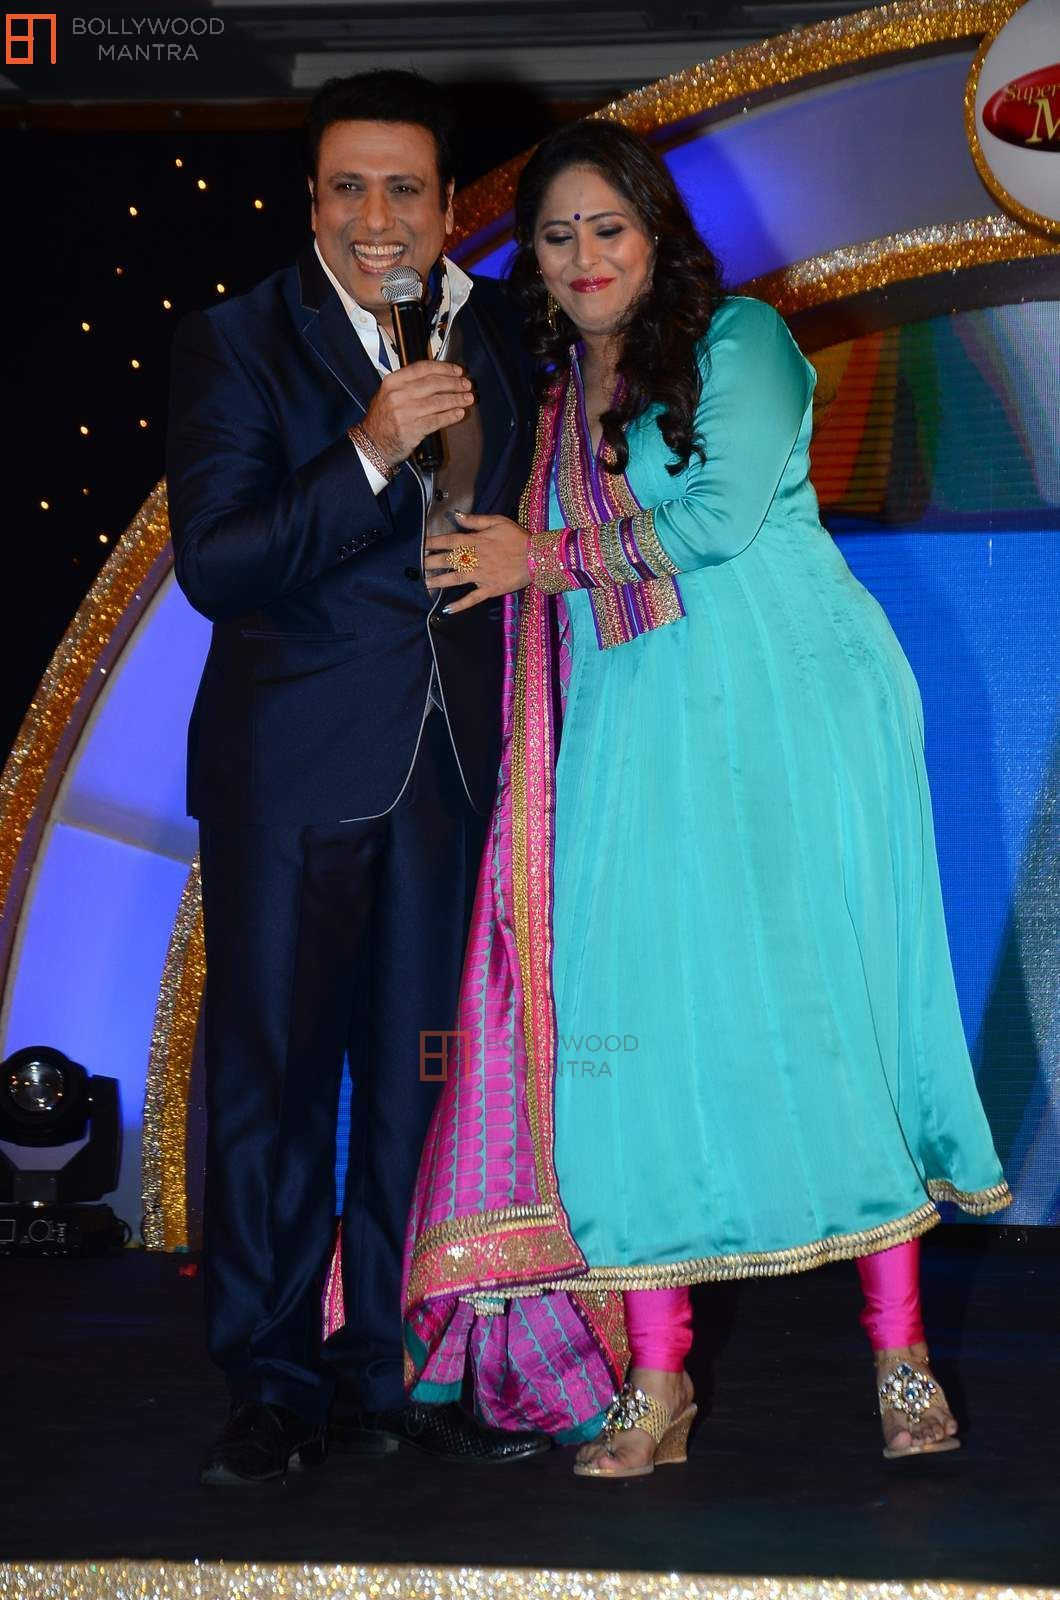 Magnificent Kareena Kapoor Wedding Outfits Photos - Wedding Ideas ...